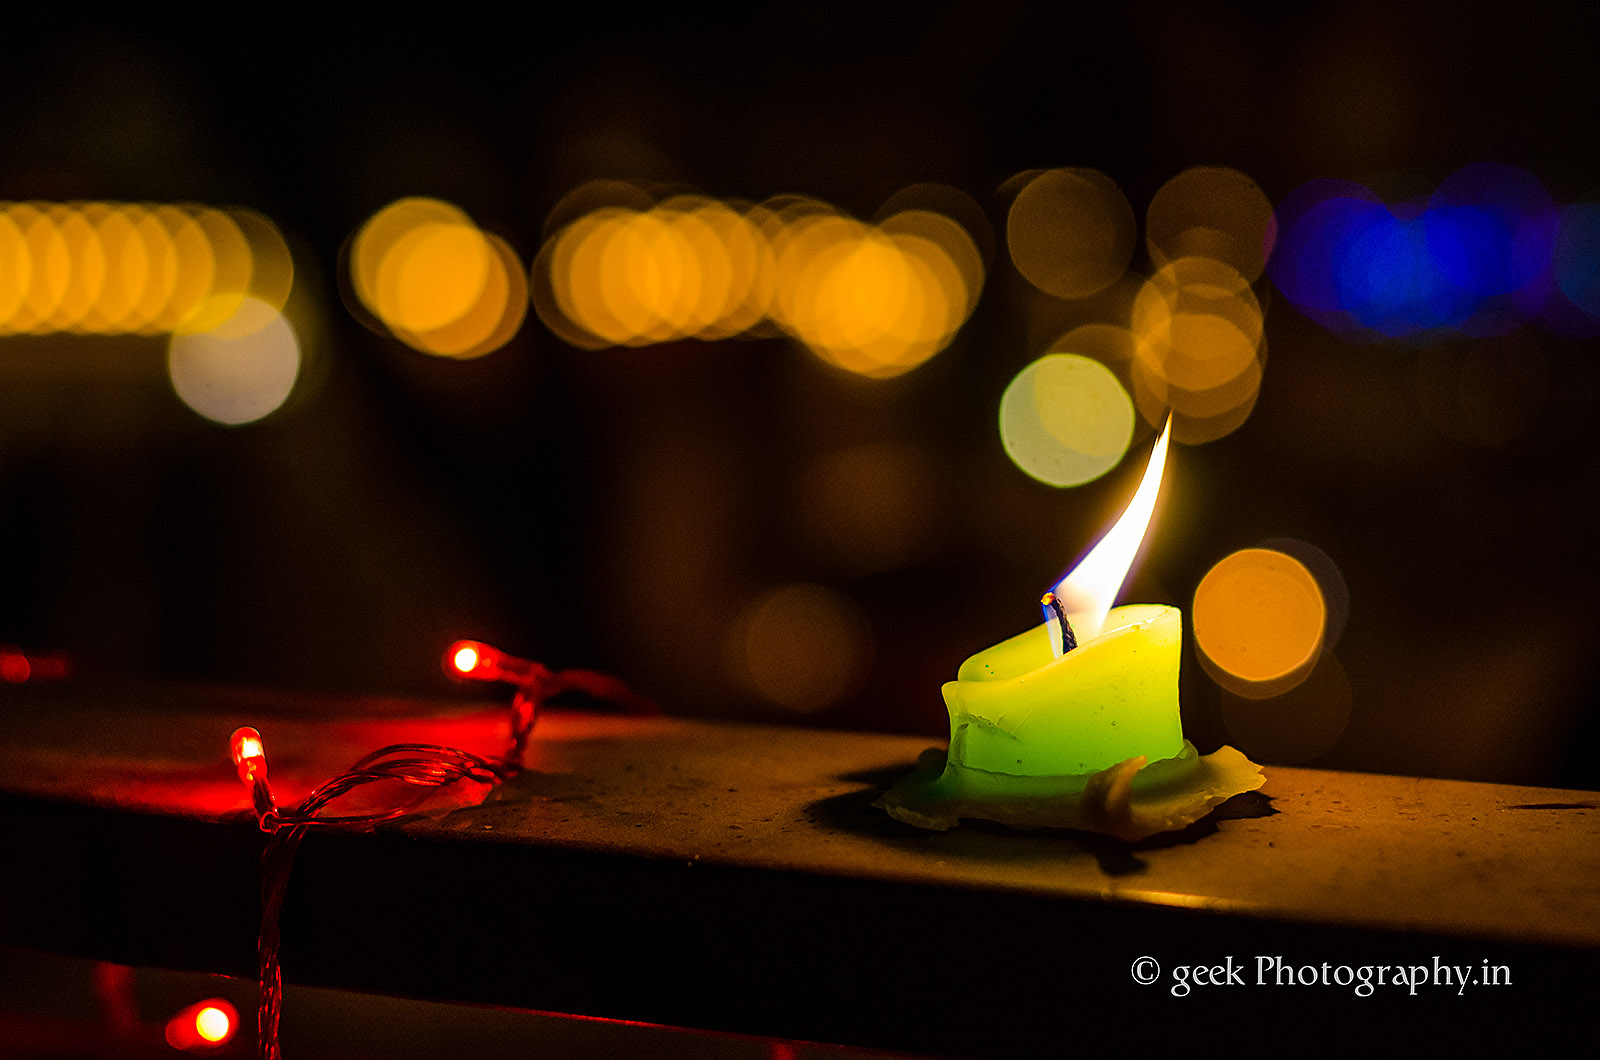 Diwali Lights, Candles, Crackers